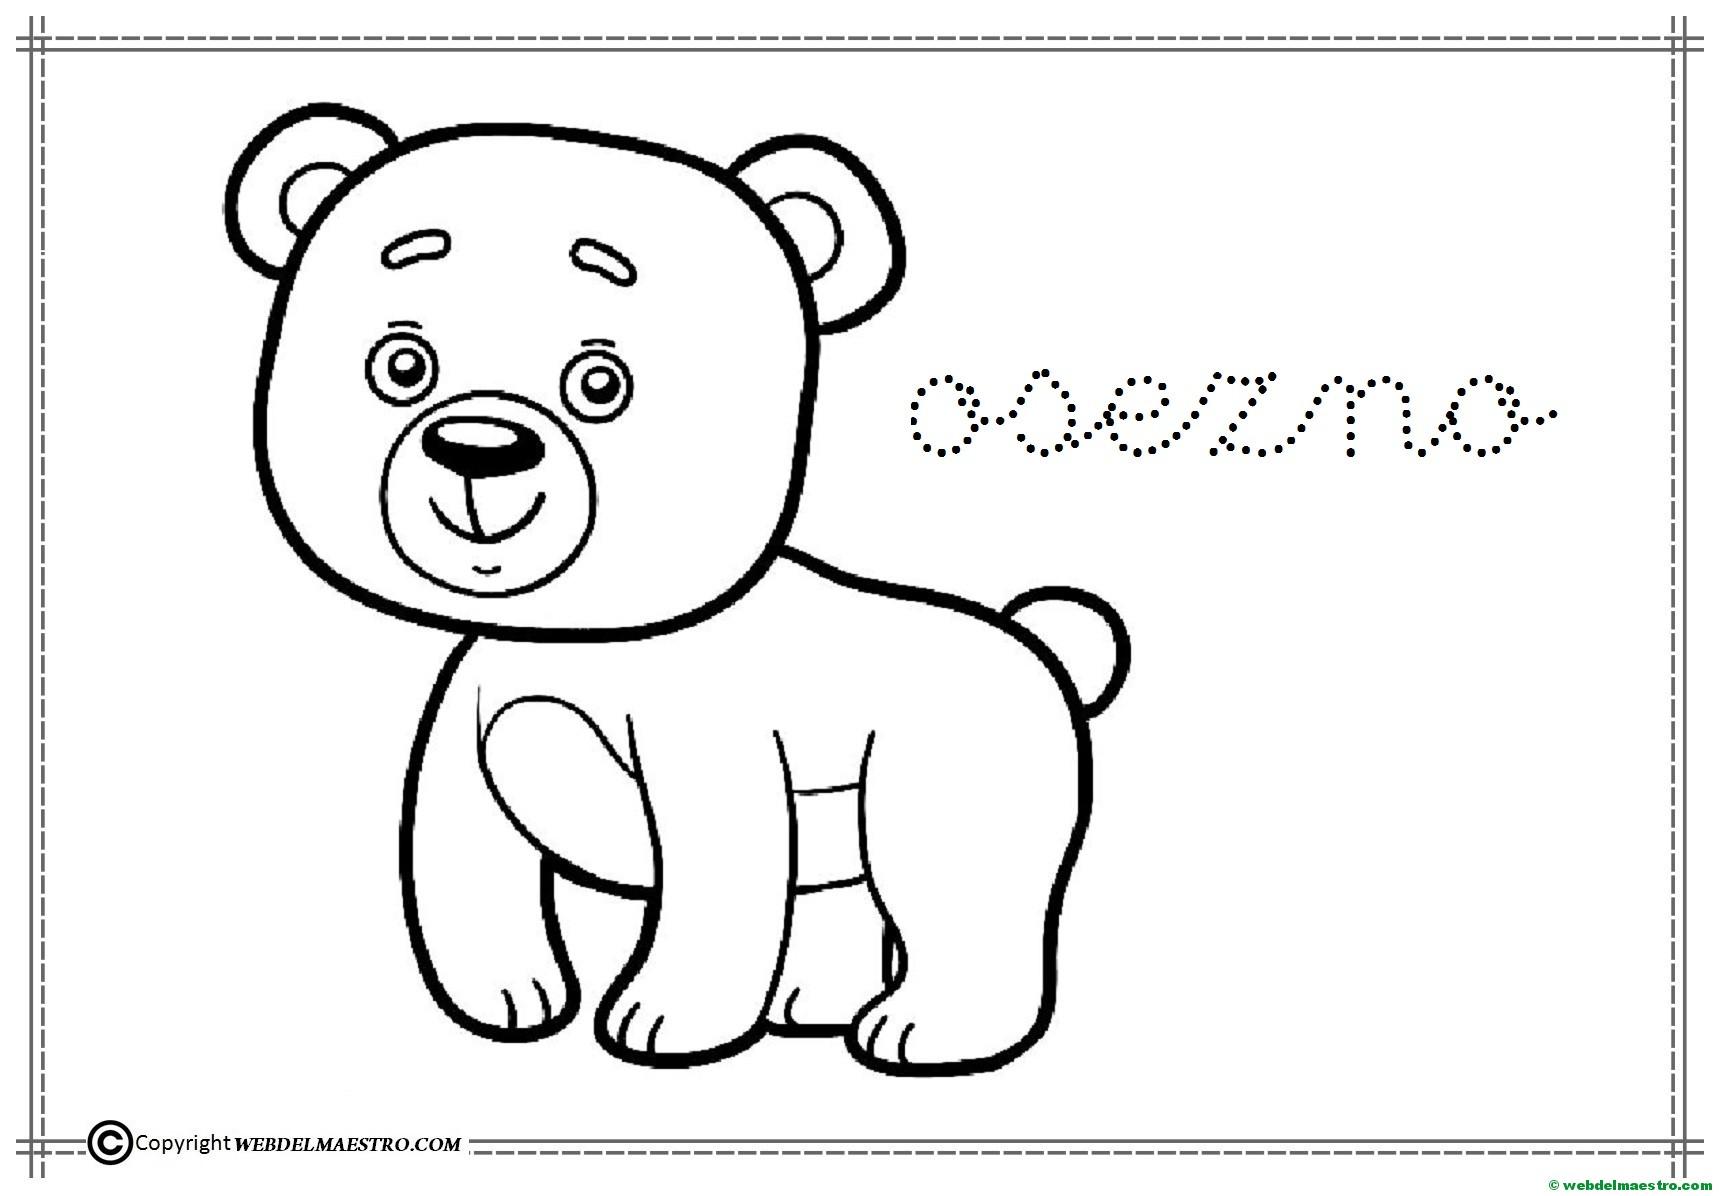 Dibujos Para Colorear Infantiles Dibujos Personajes: Dibujos Para Colorear Fáciles